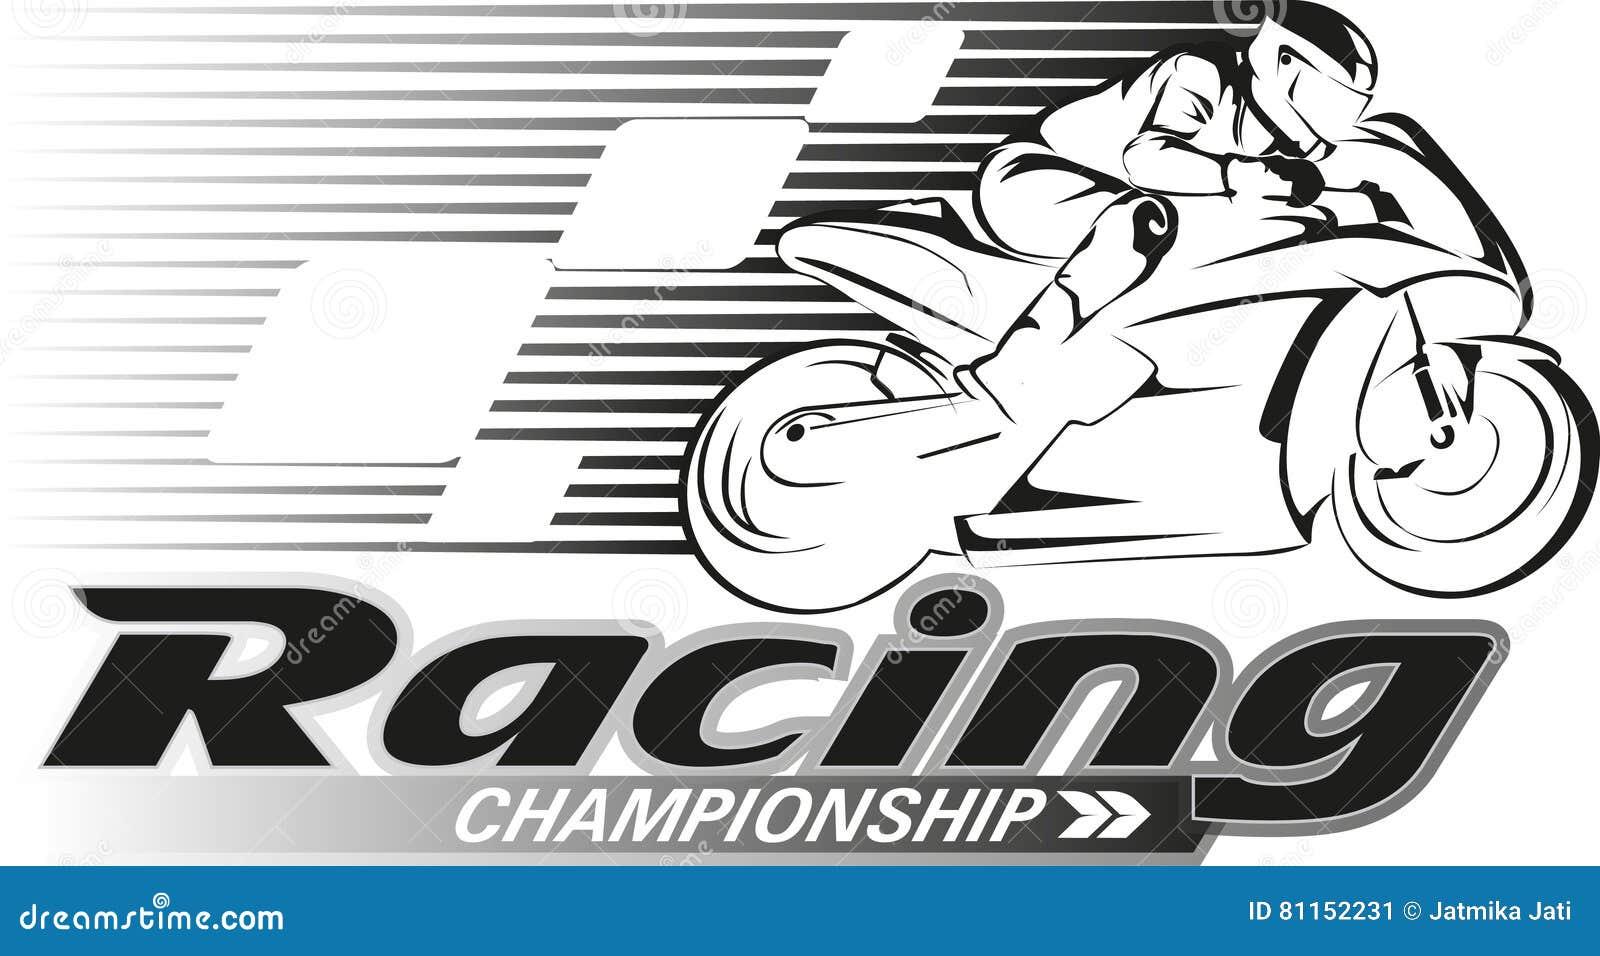 Racing Championship Stock Vector Illustration Of Logo 81152231